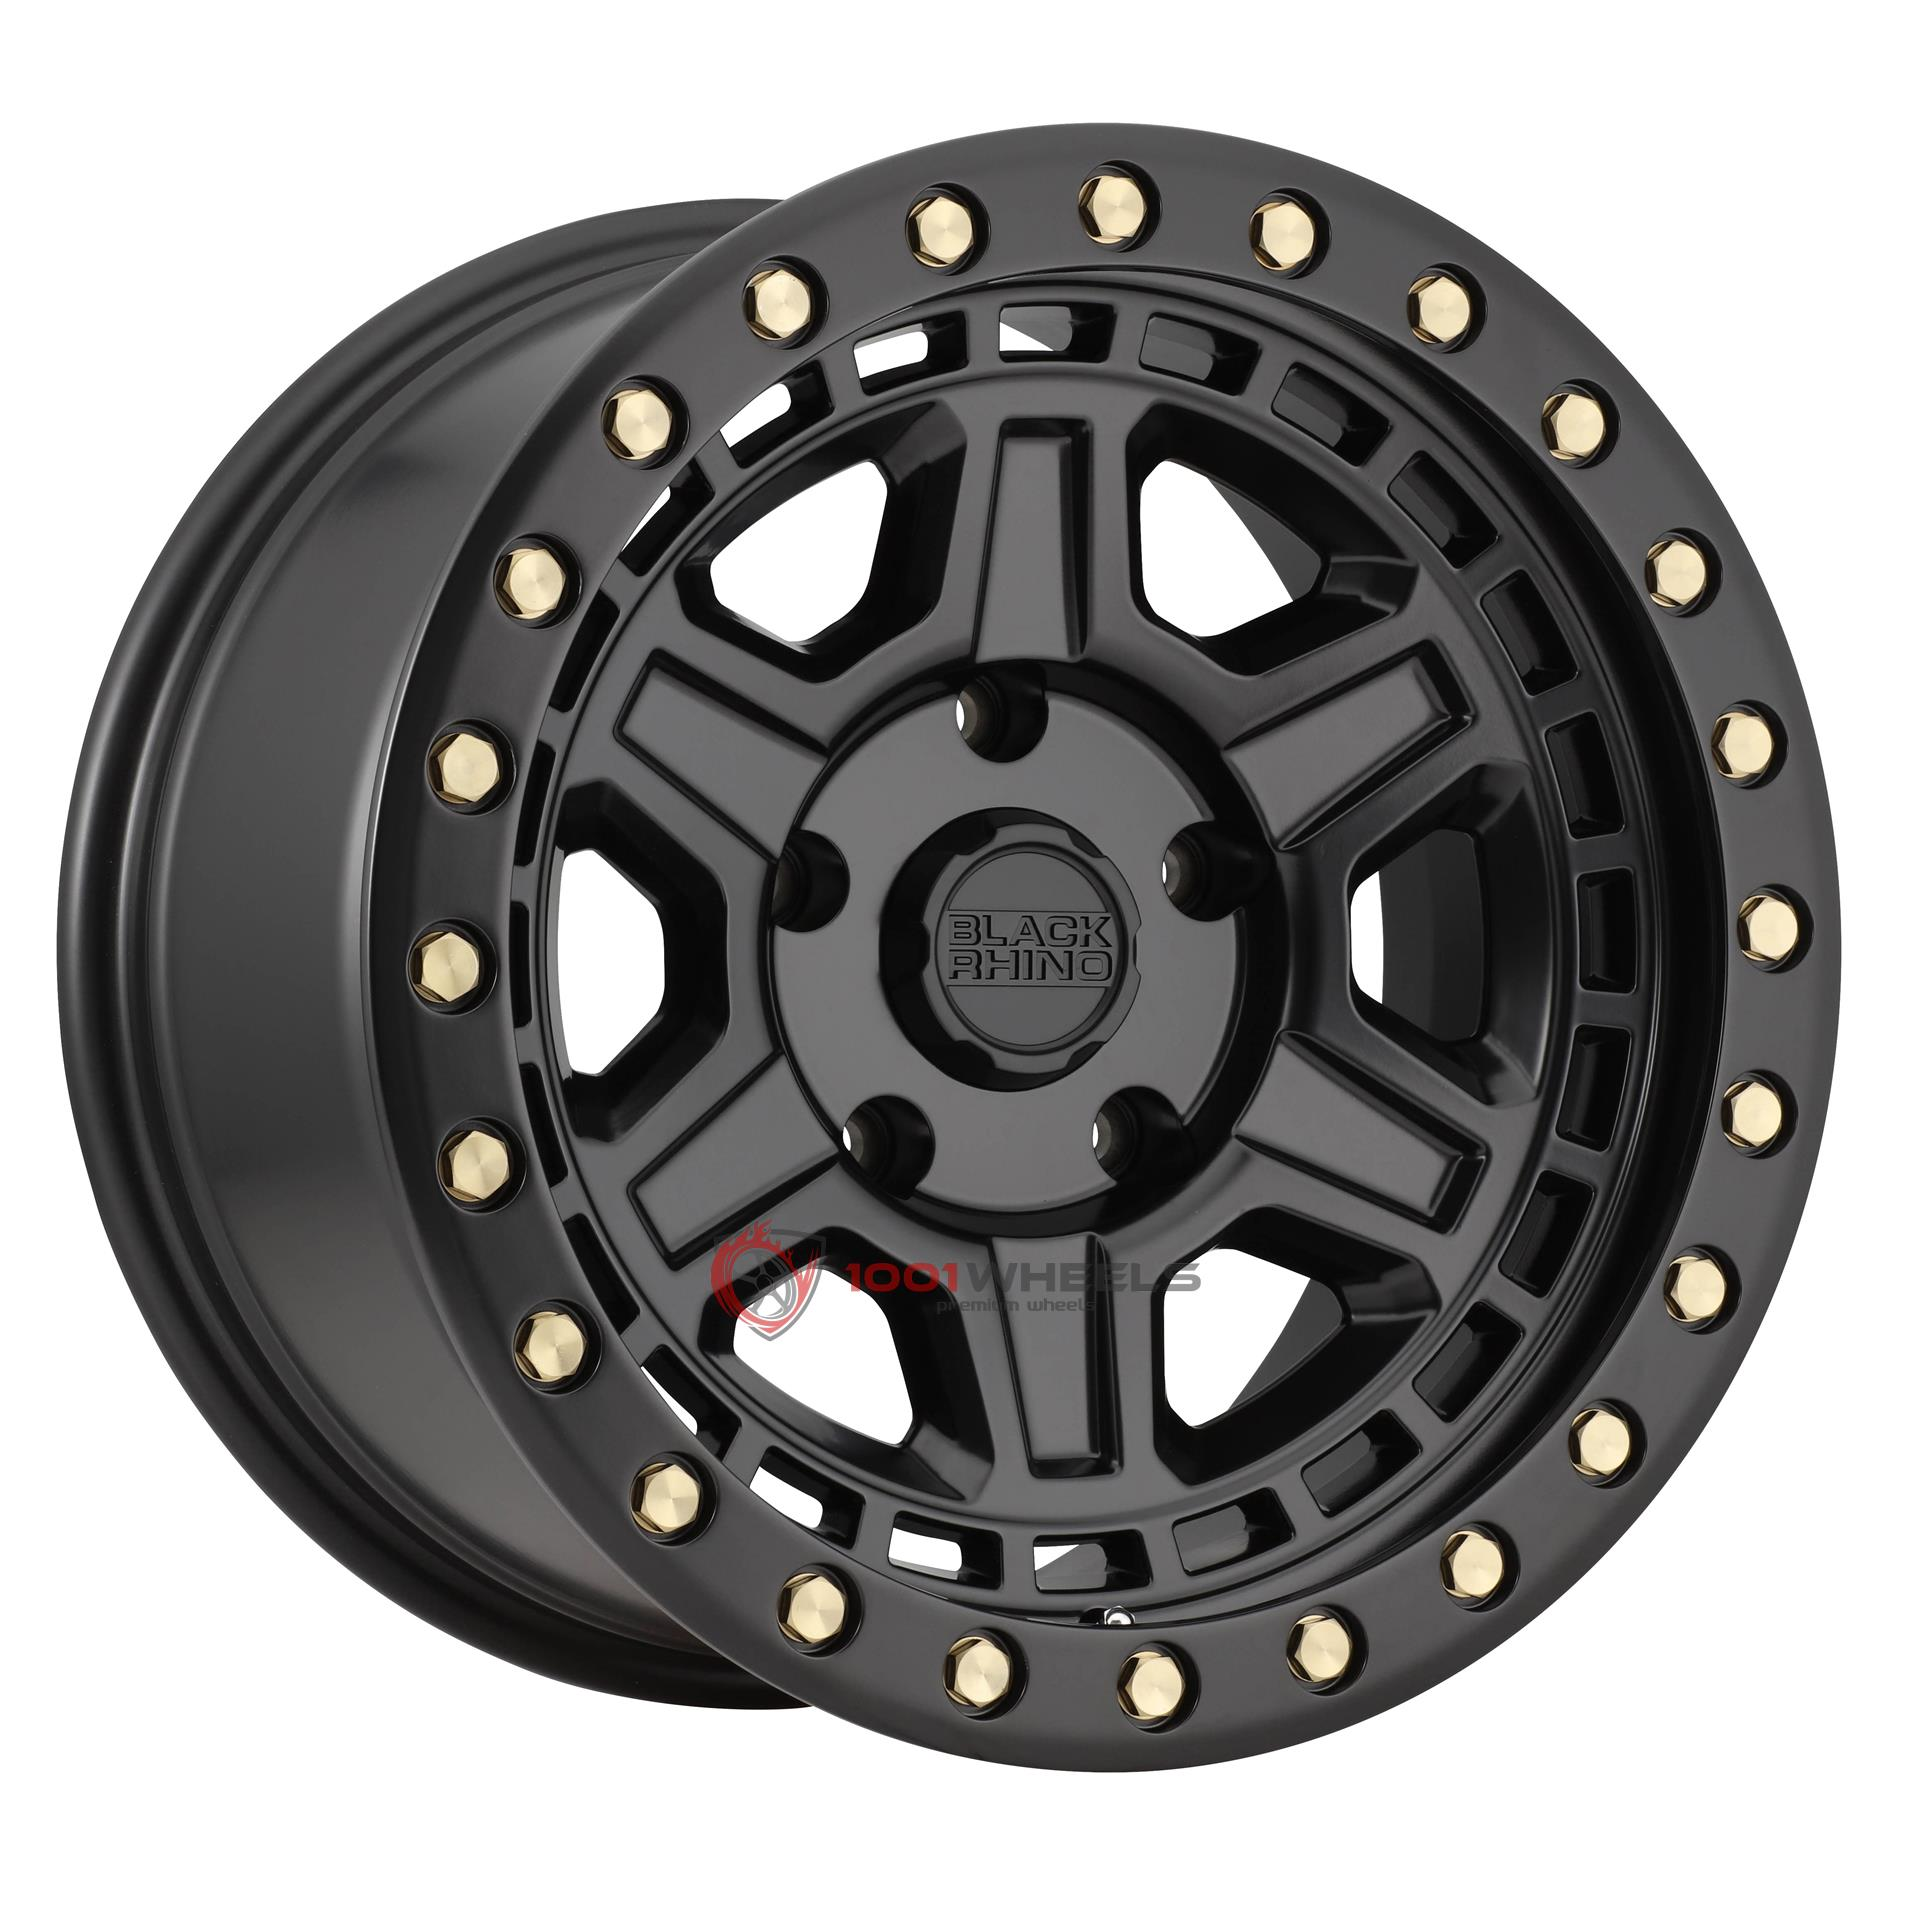 BLACK RHINO RENO matte-black-wbrass-bolts